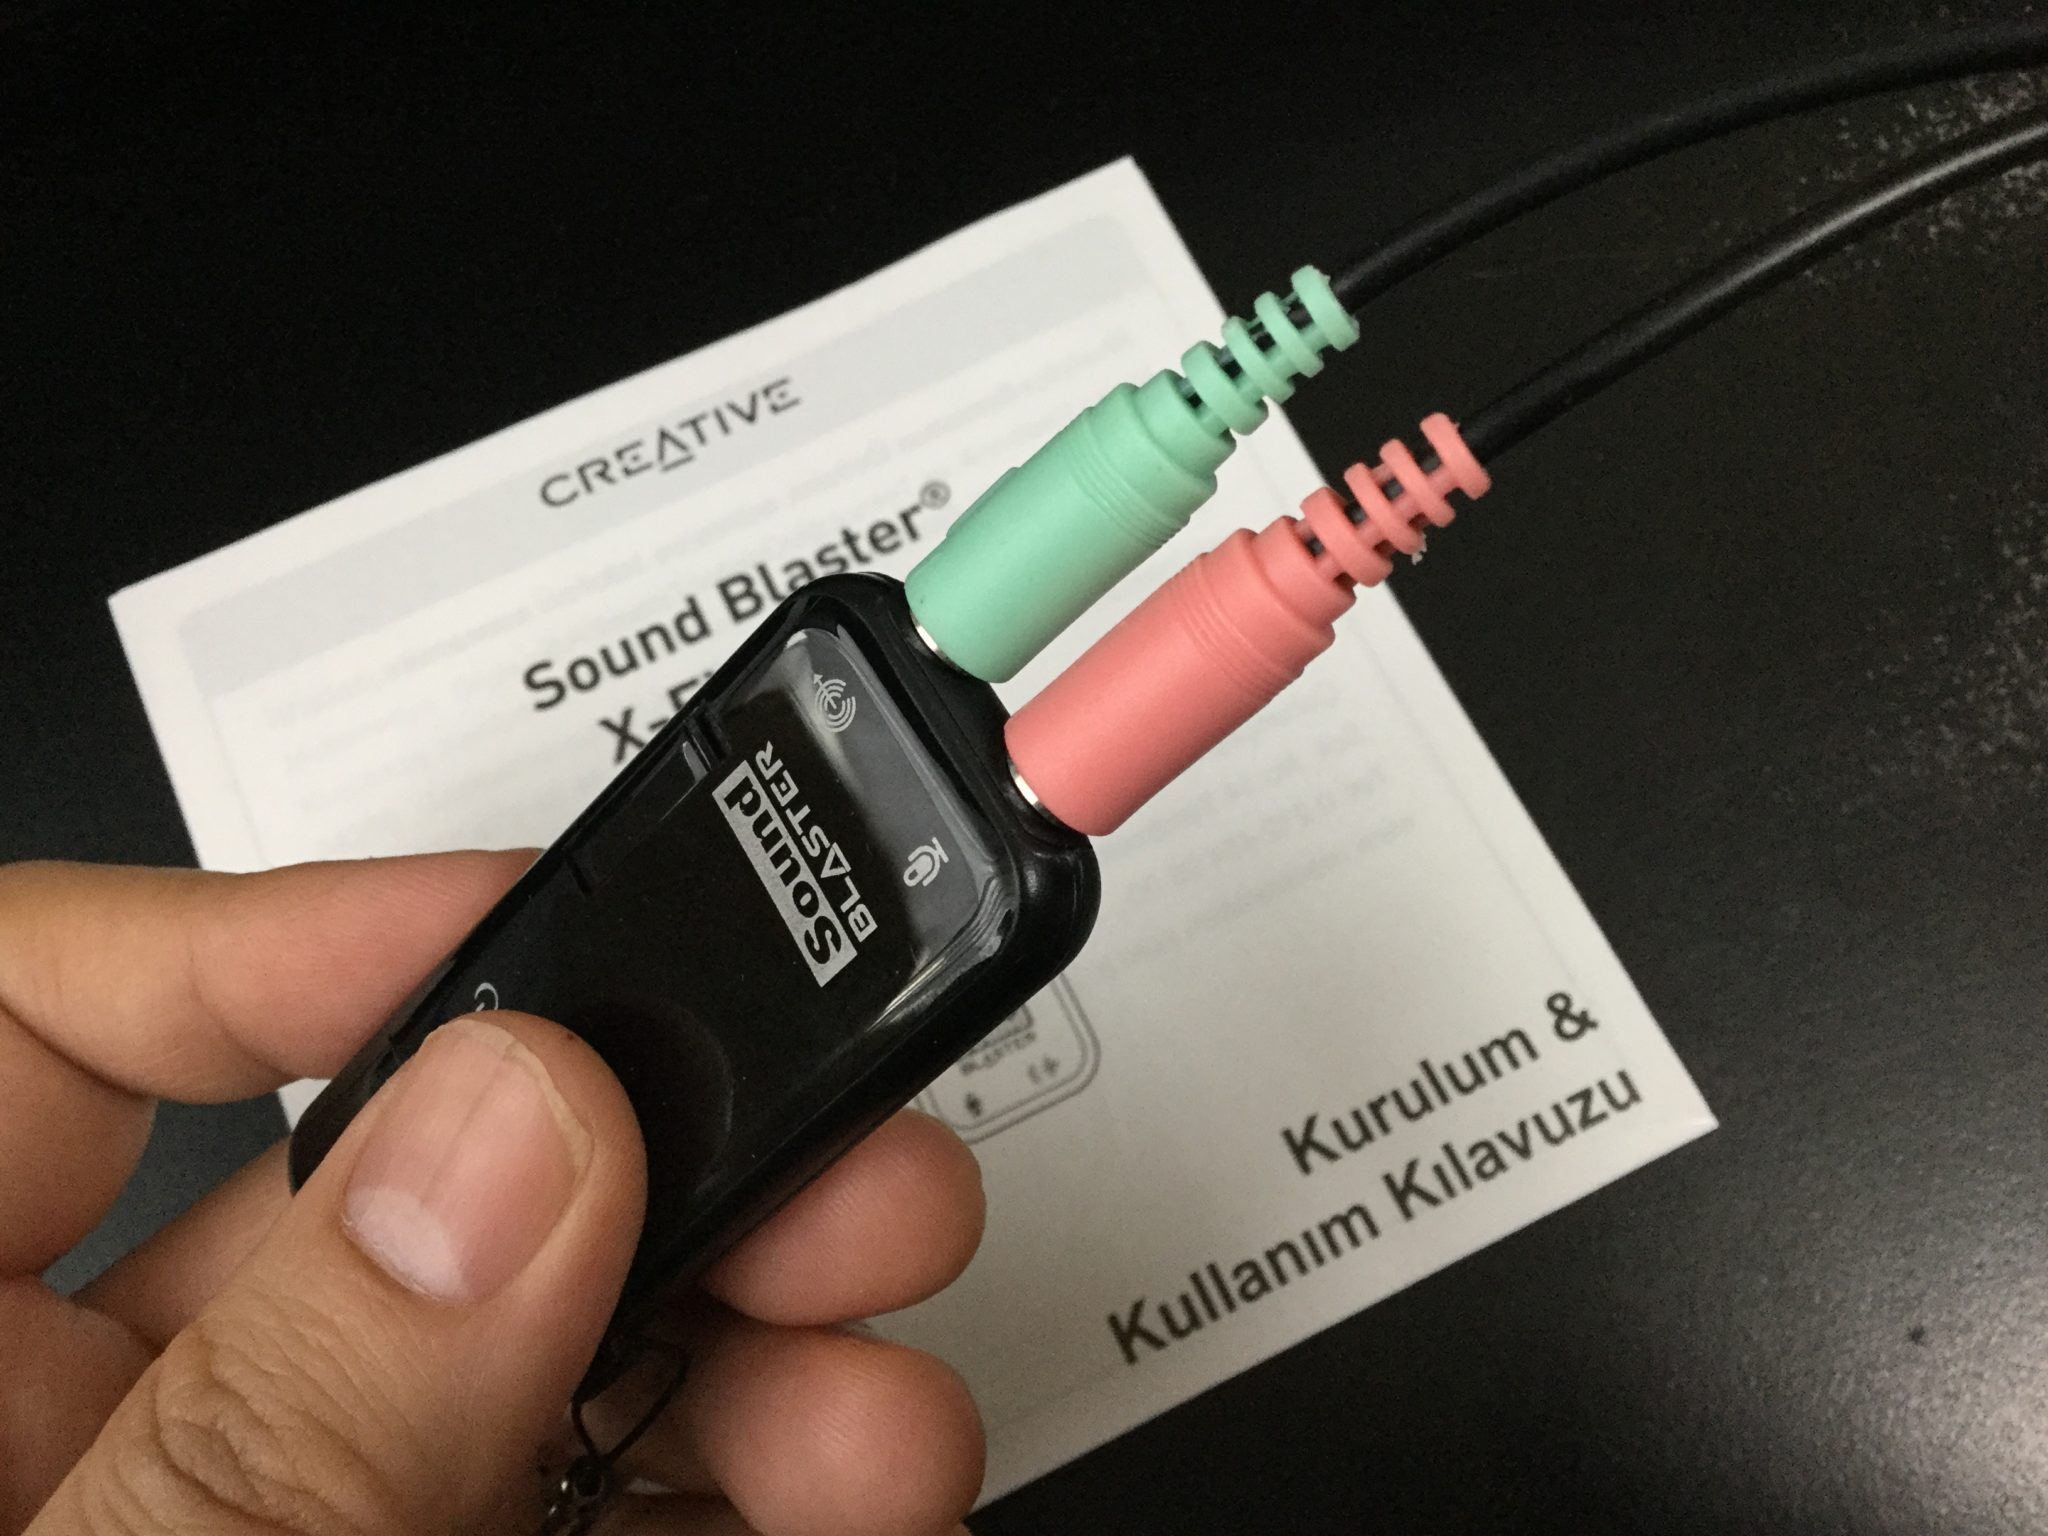 Sound Blaster X-Fi Go! Pro r2 Creative SB-XFI-GPR2